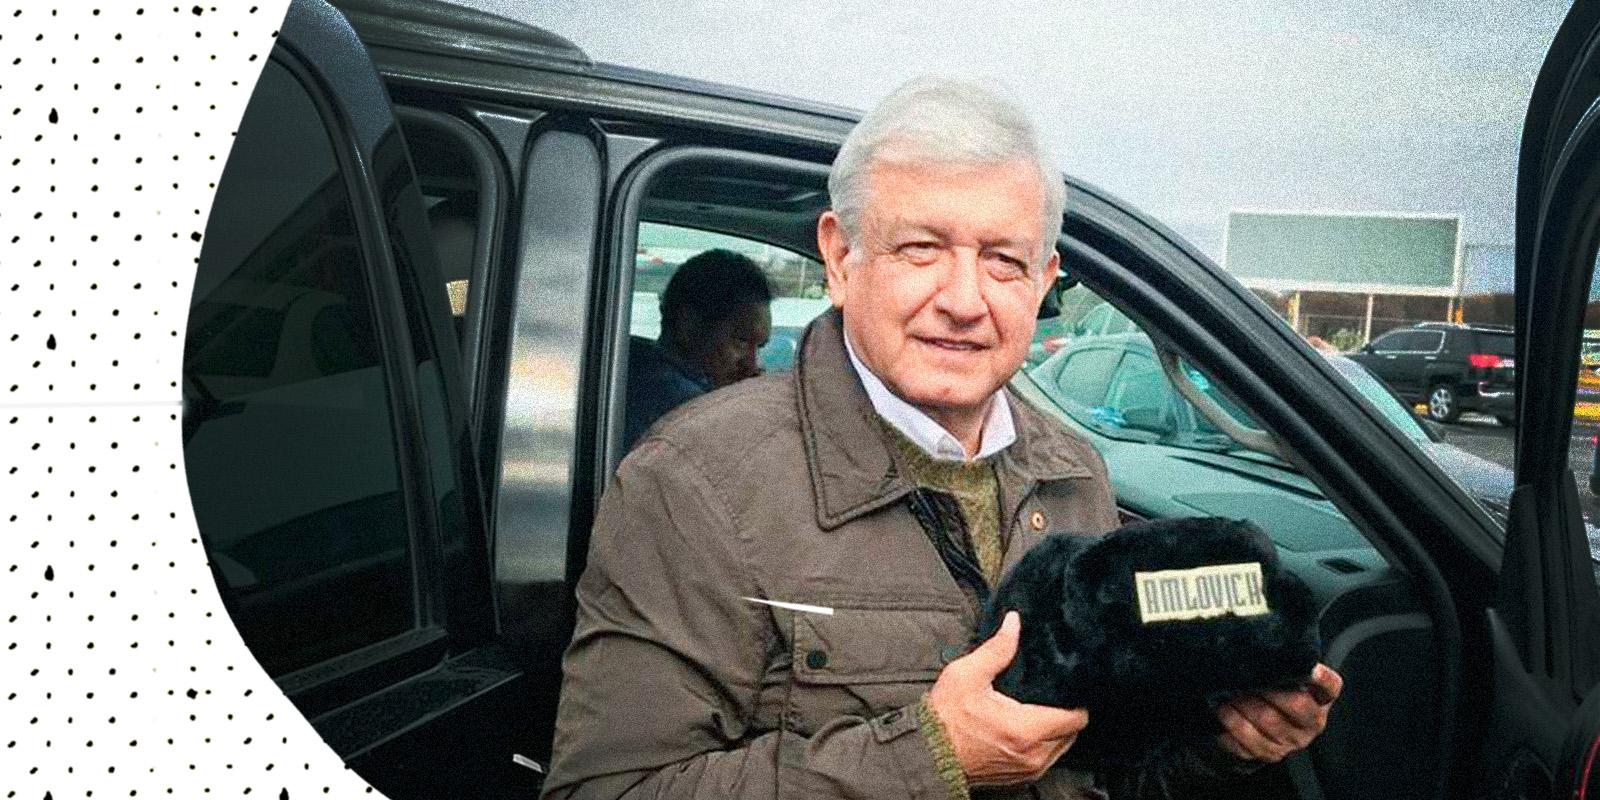 Los rusos apoyan a Andrés Manuel López Obrador... pero ese video es falso.